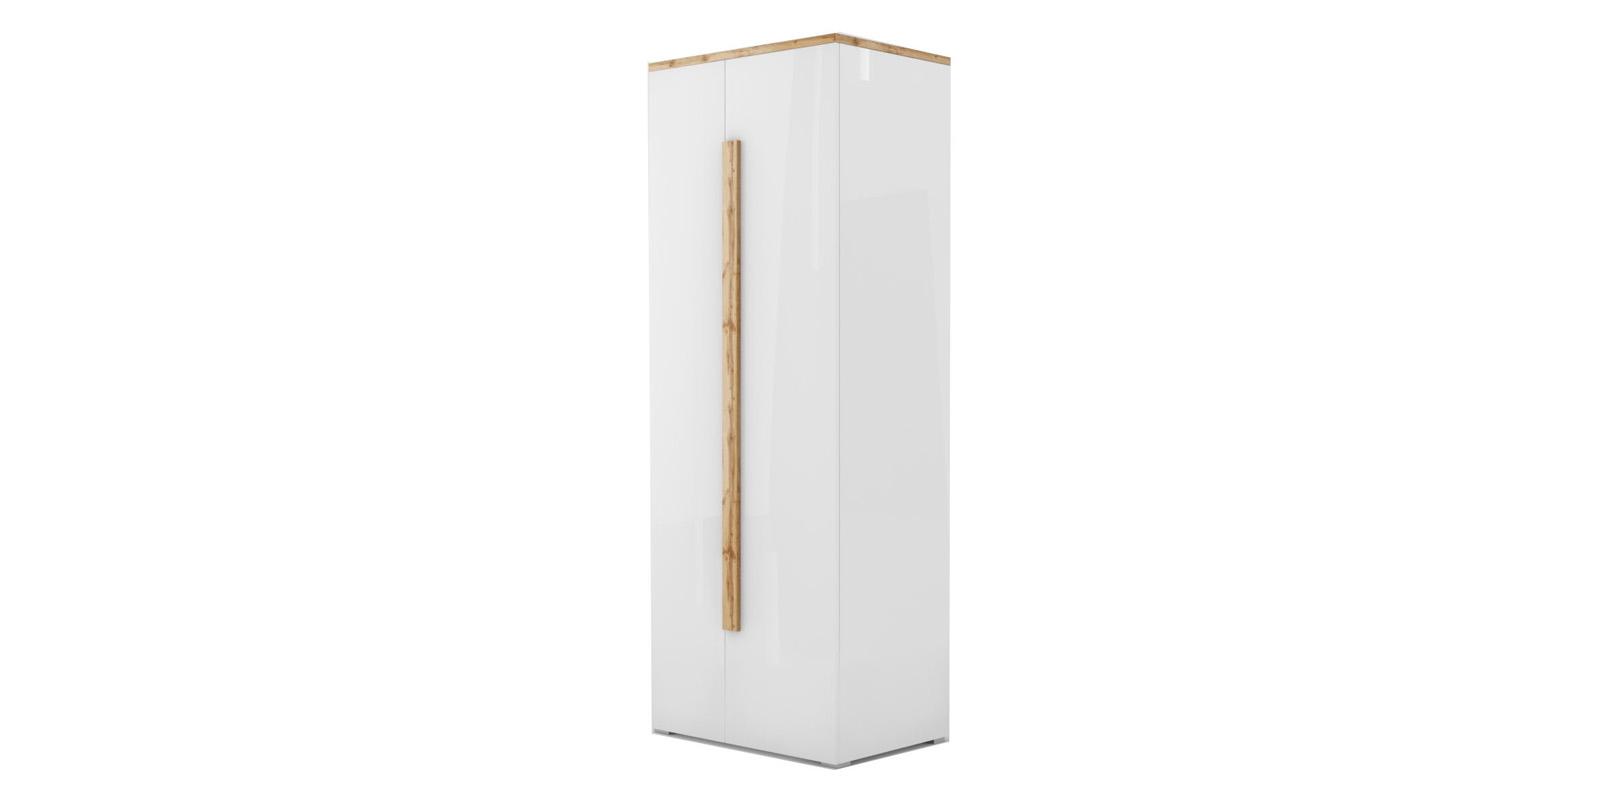 Шкаф распашной двухдверный Сахара вариант №1 (дуб ватан/белый лак) 1903.М1 HomeMe